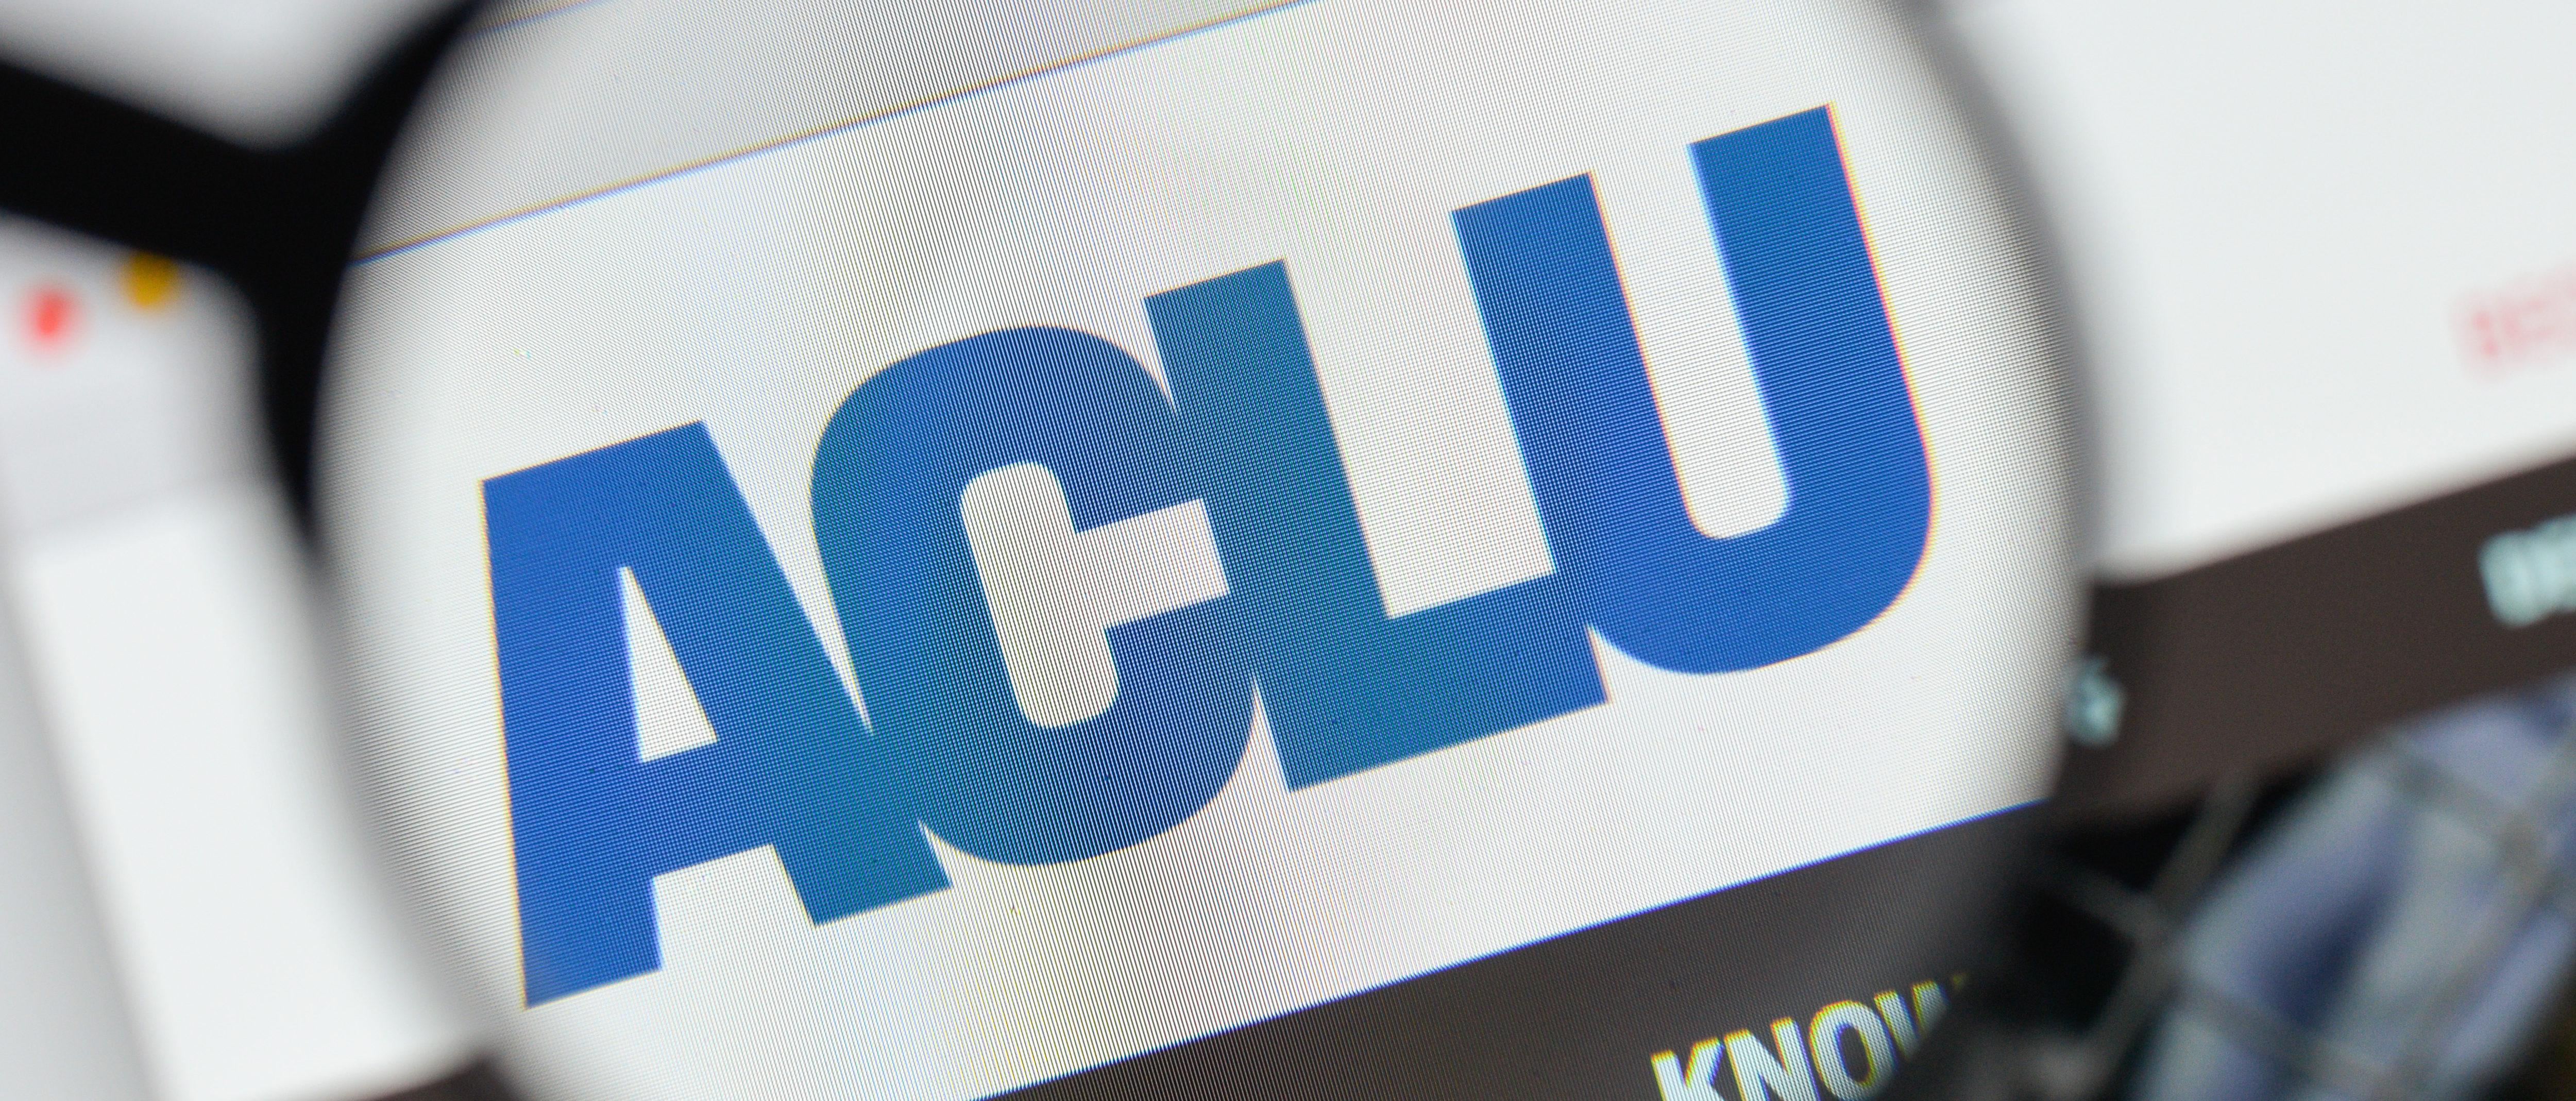 ACLU video. Casimiro PT, Shutterstock